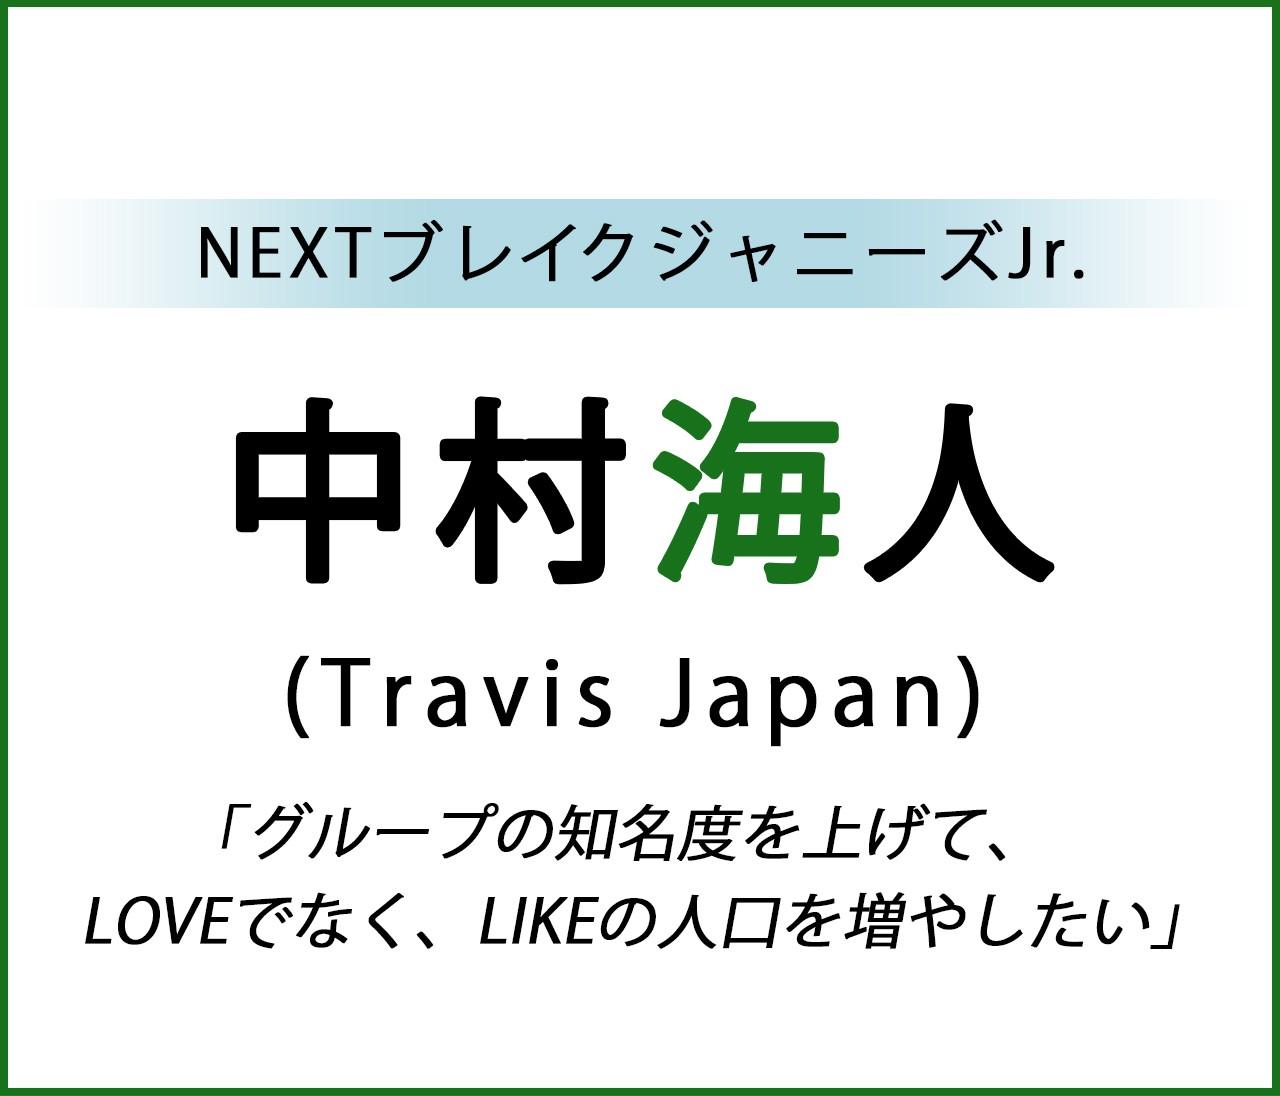 #TravisJapan #中村海人 BAILA初登場スペシャルインタビュー!【NextブレイクジャニーズJr.】